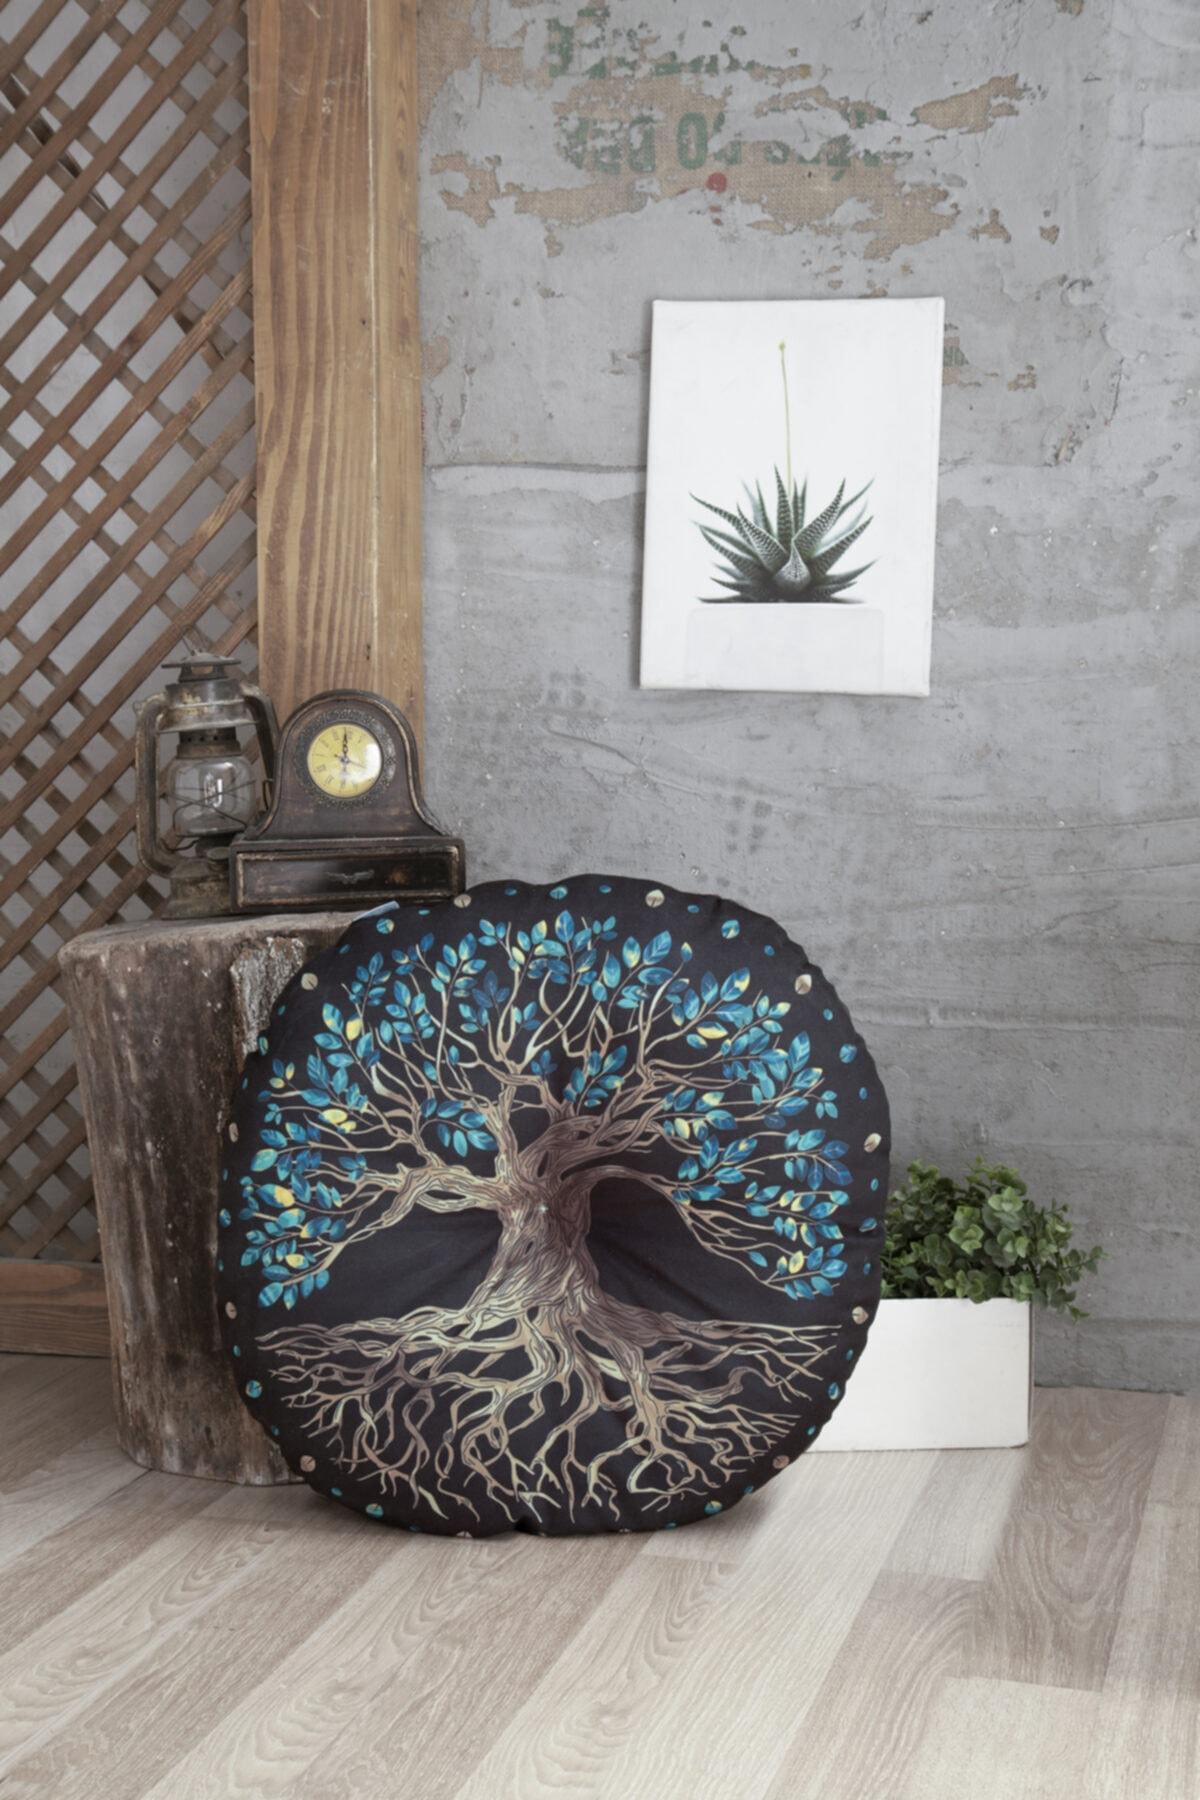 Home & Bath Dekoratif Yer Minderi Yggdrasill